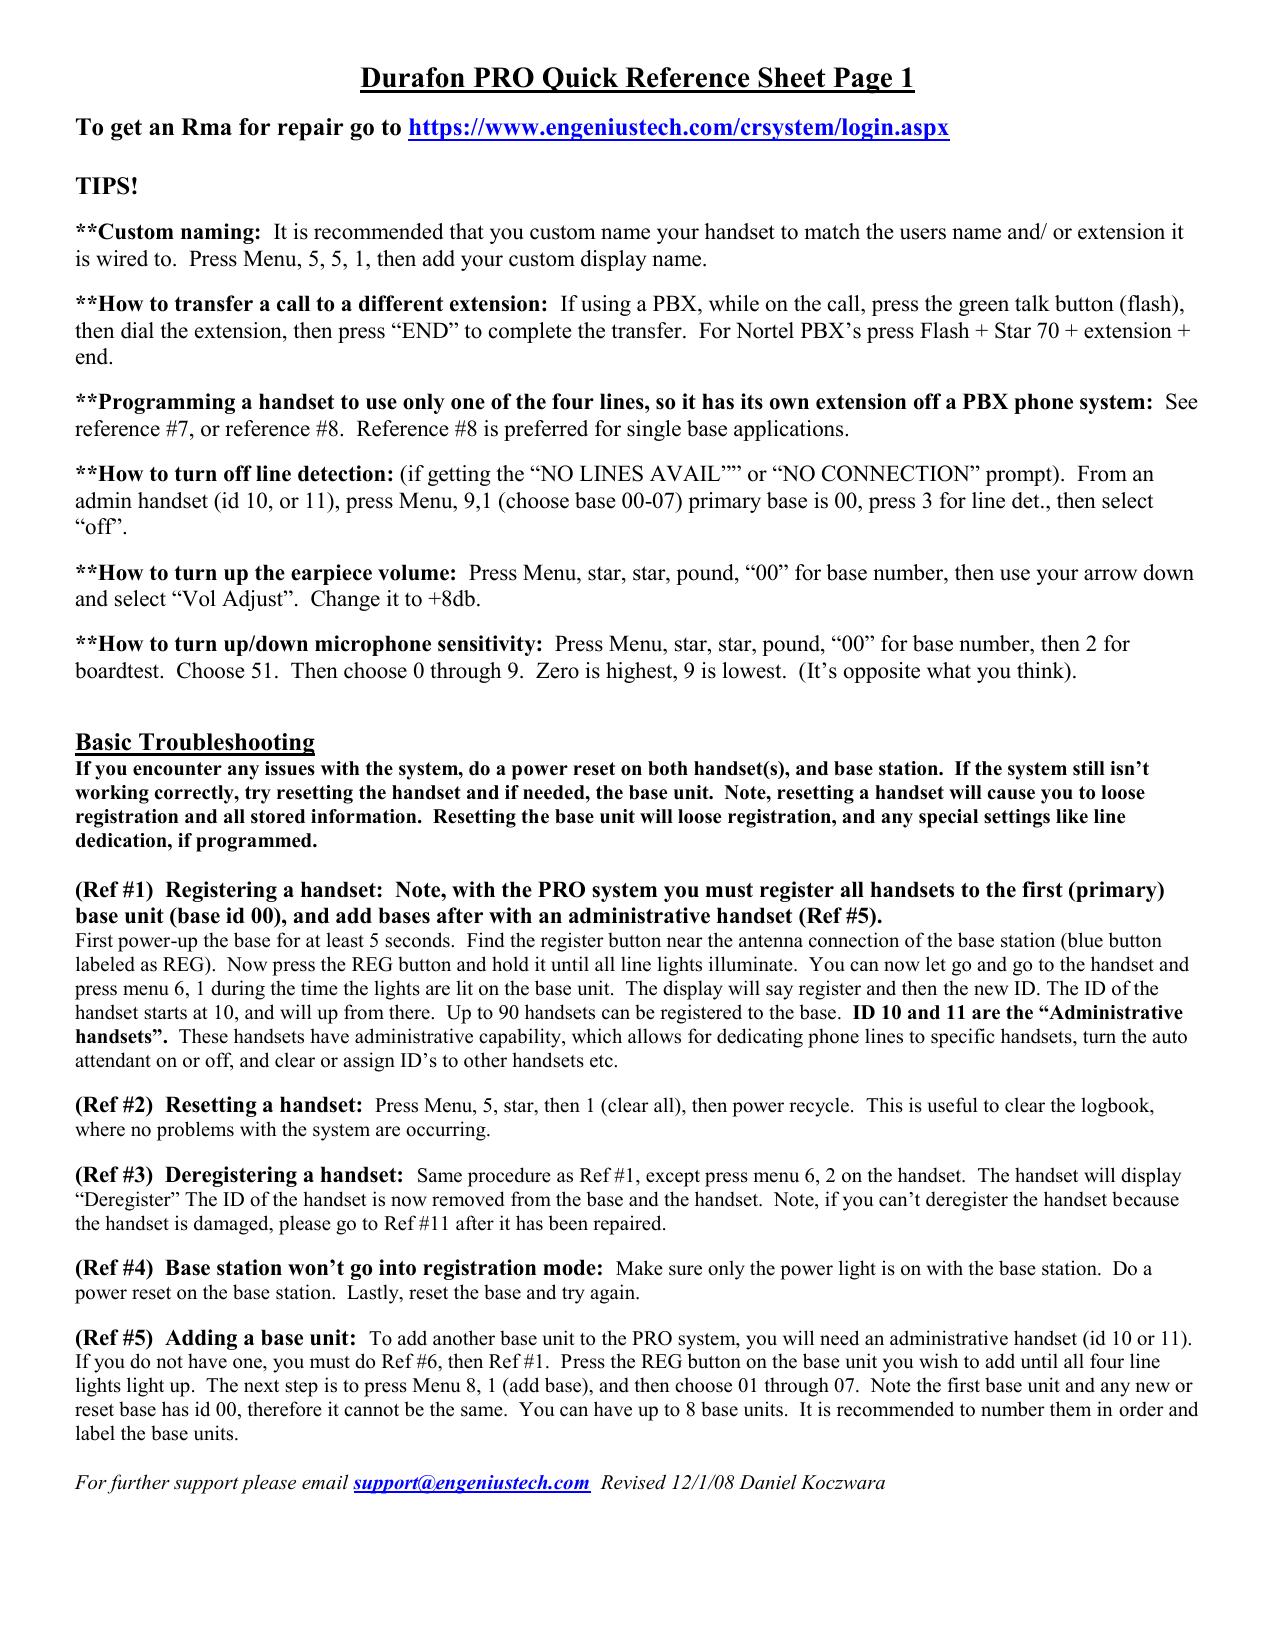 Durafon PRO Quick Reference Sheet Page 1